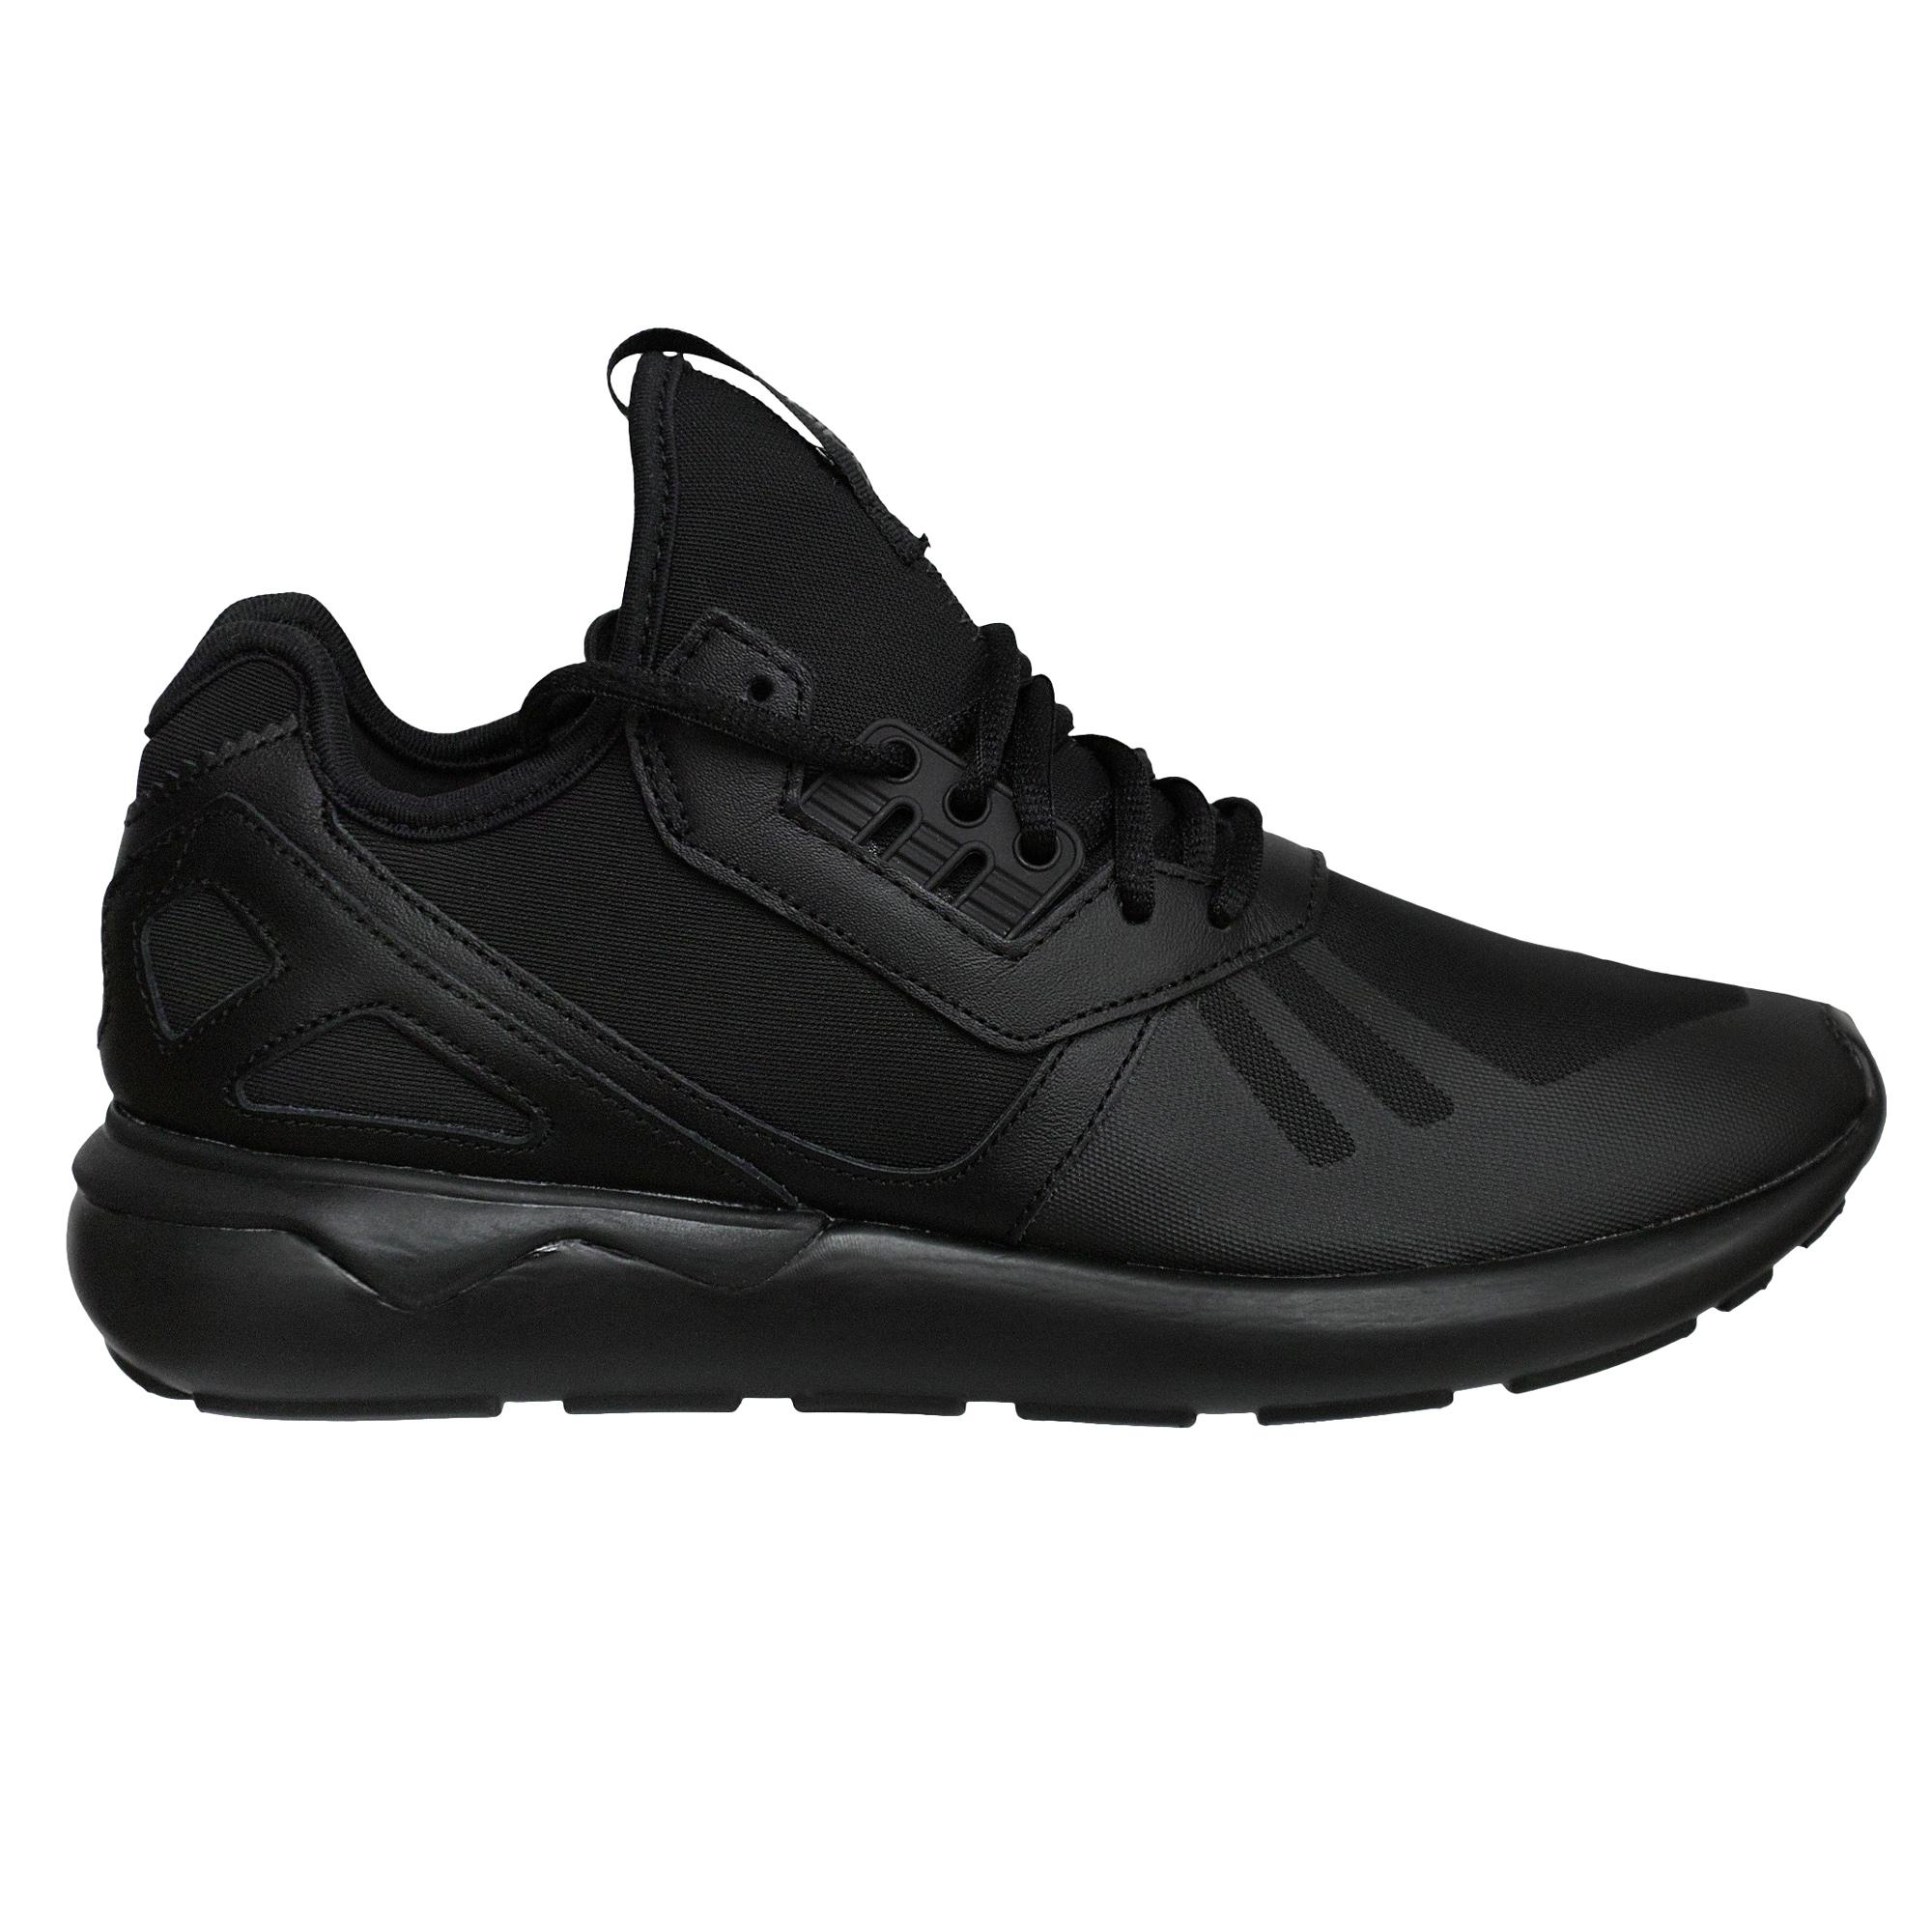 37348a7bd5ad58 ... low price adidas tubular runner sneaker freizeitschuhe sportschuhe  b25089 schwarz 001 fc13a 56338